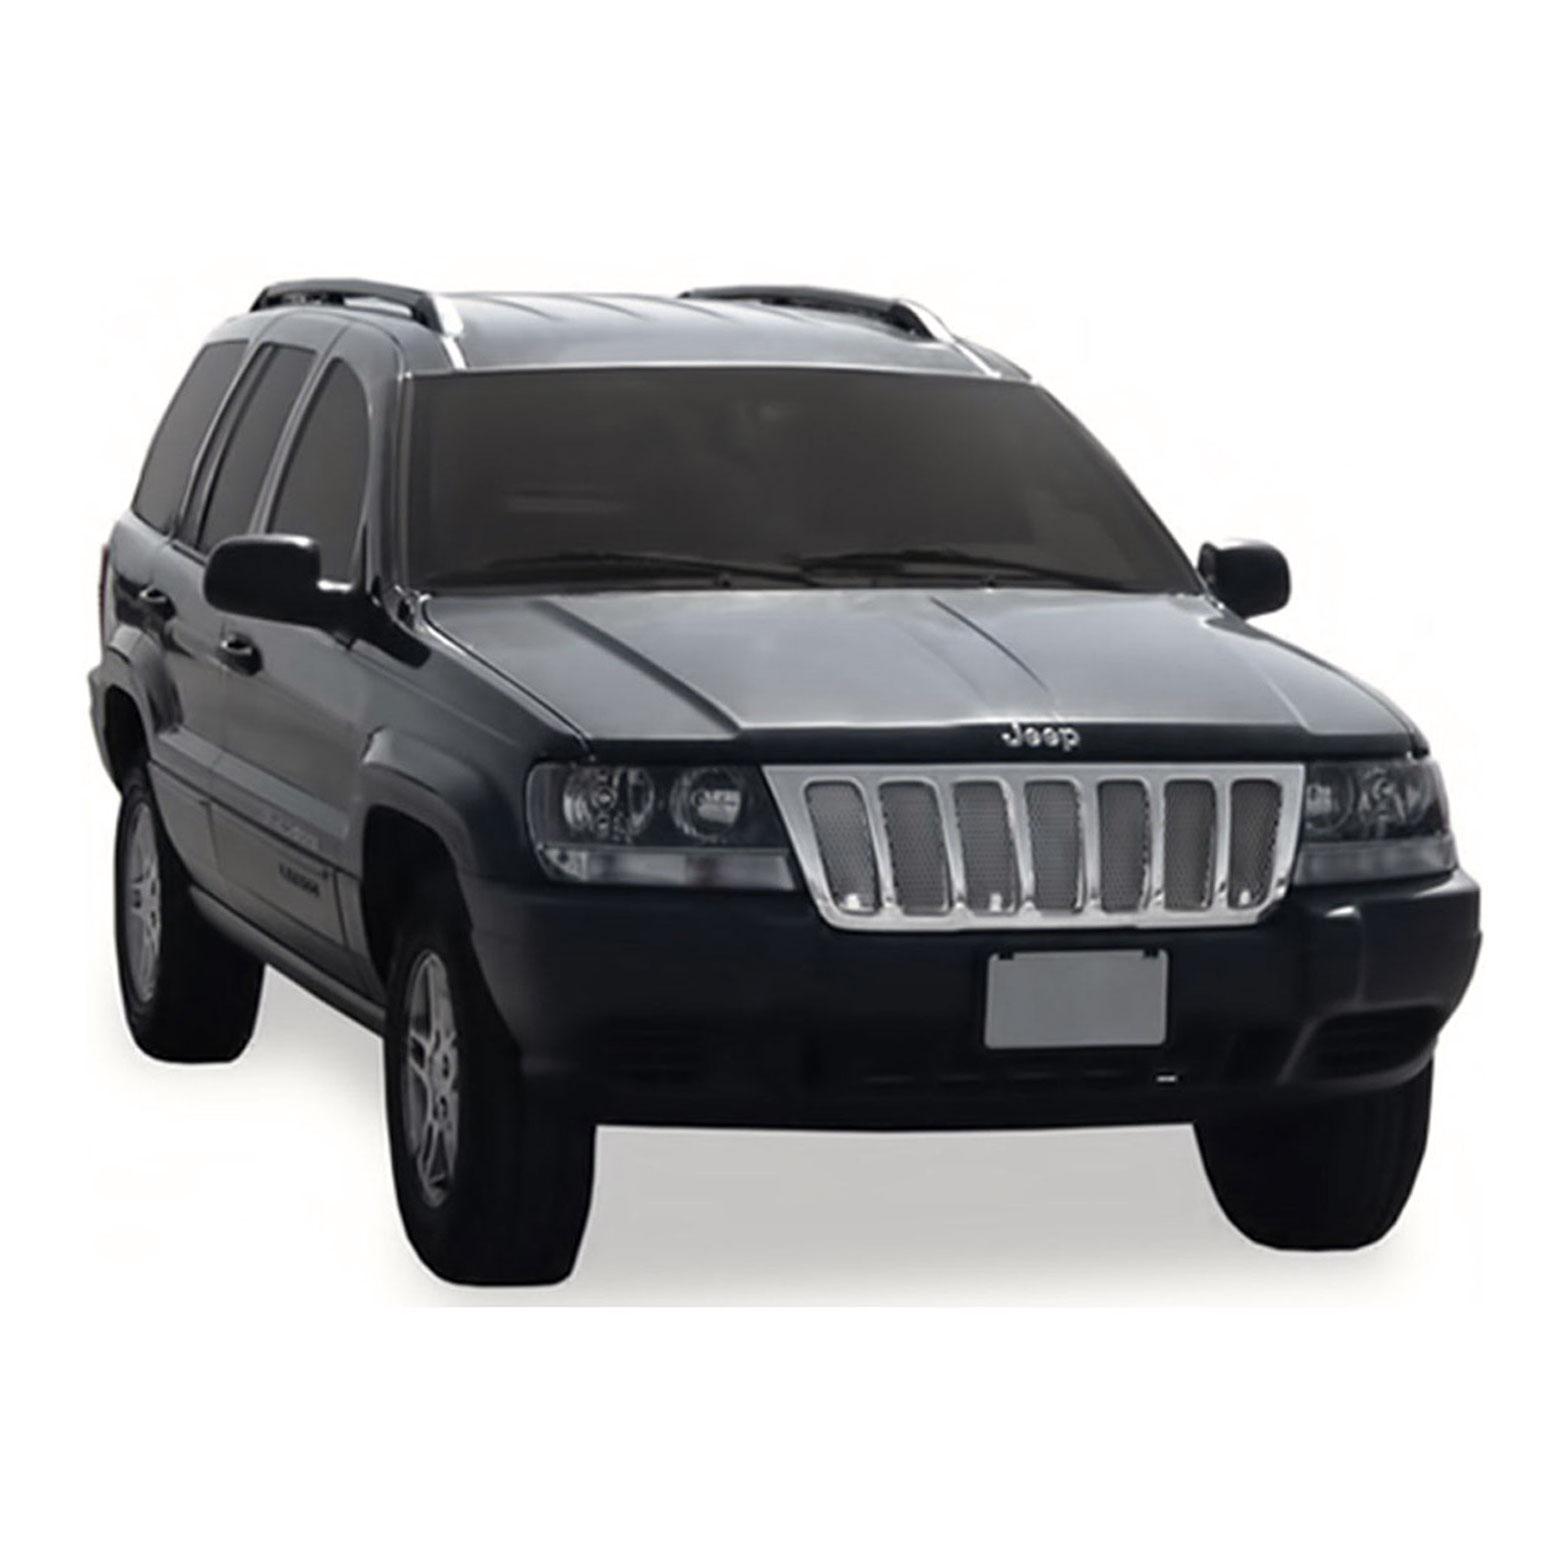 Full Mirror Covers for 1999-2004 Jeep Grand Cherokee Premium FX Chrome